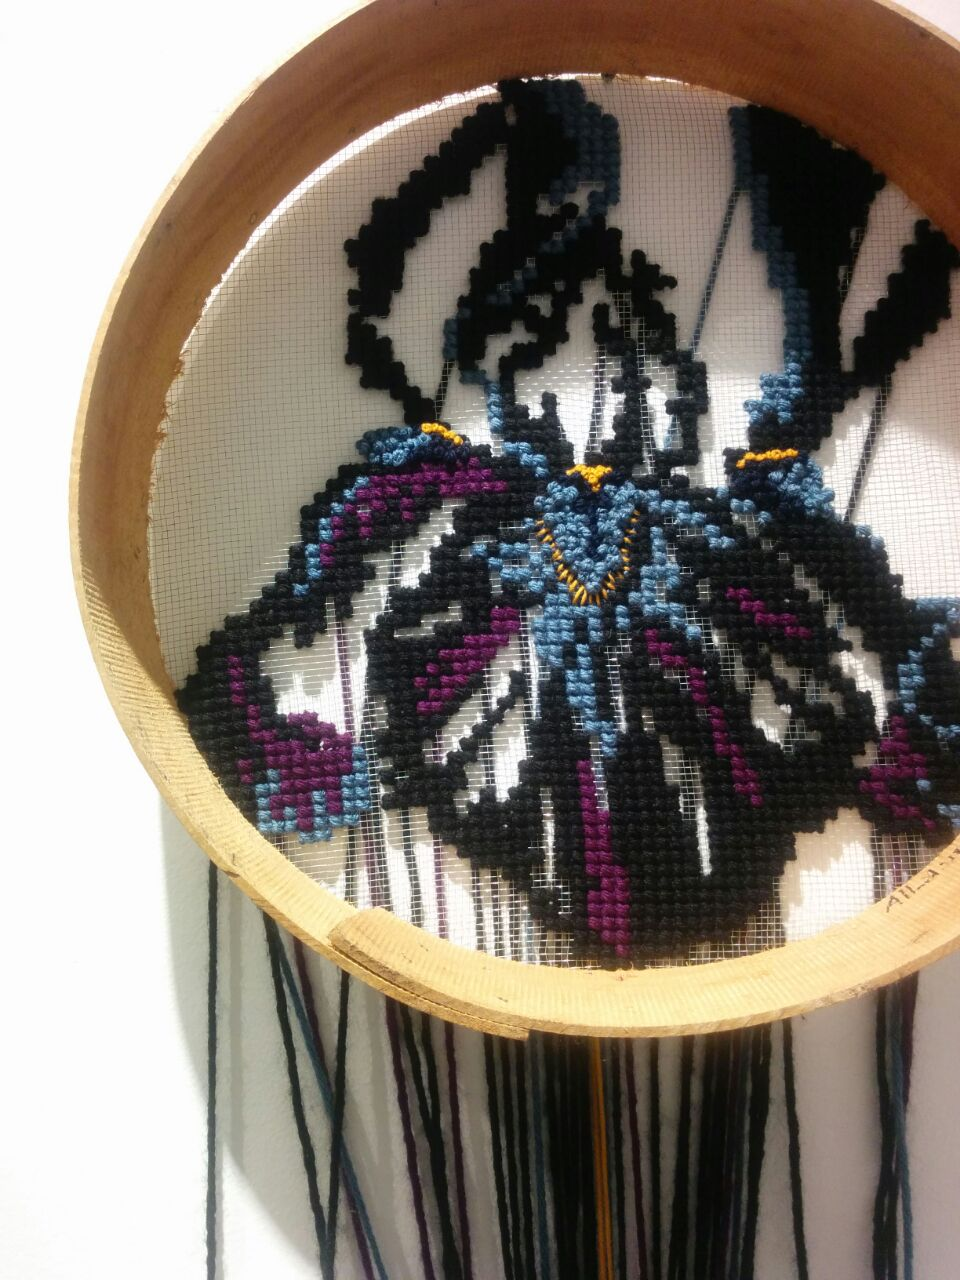 The black Iris, Jordan's national symbol, by Johanne Allard